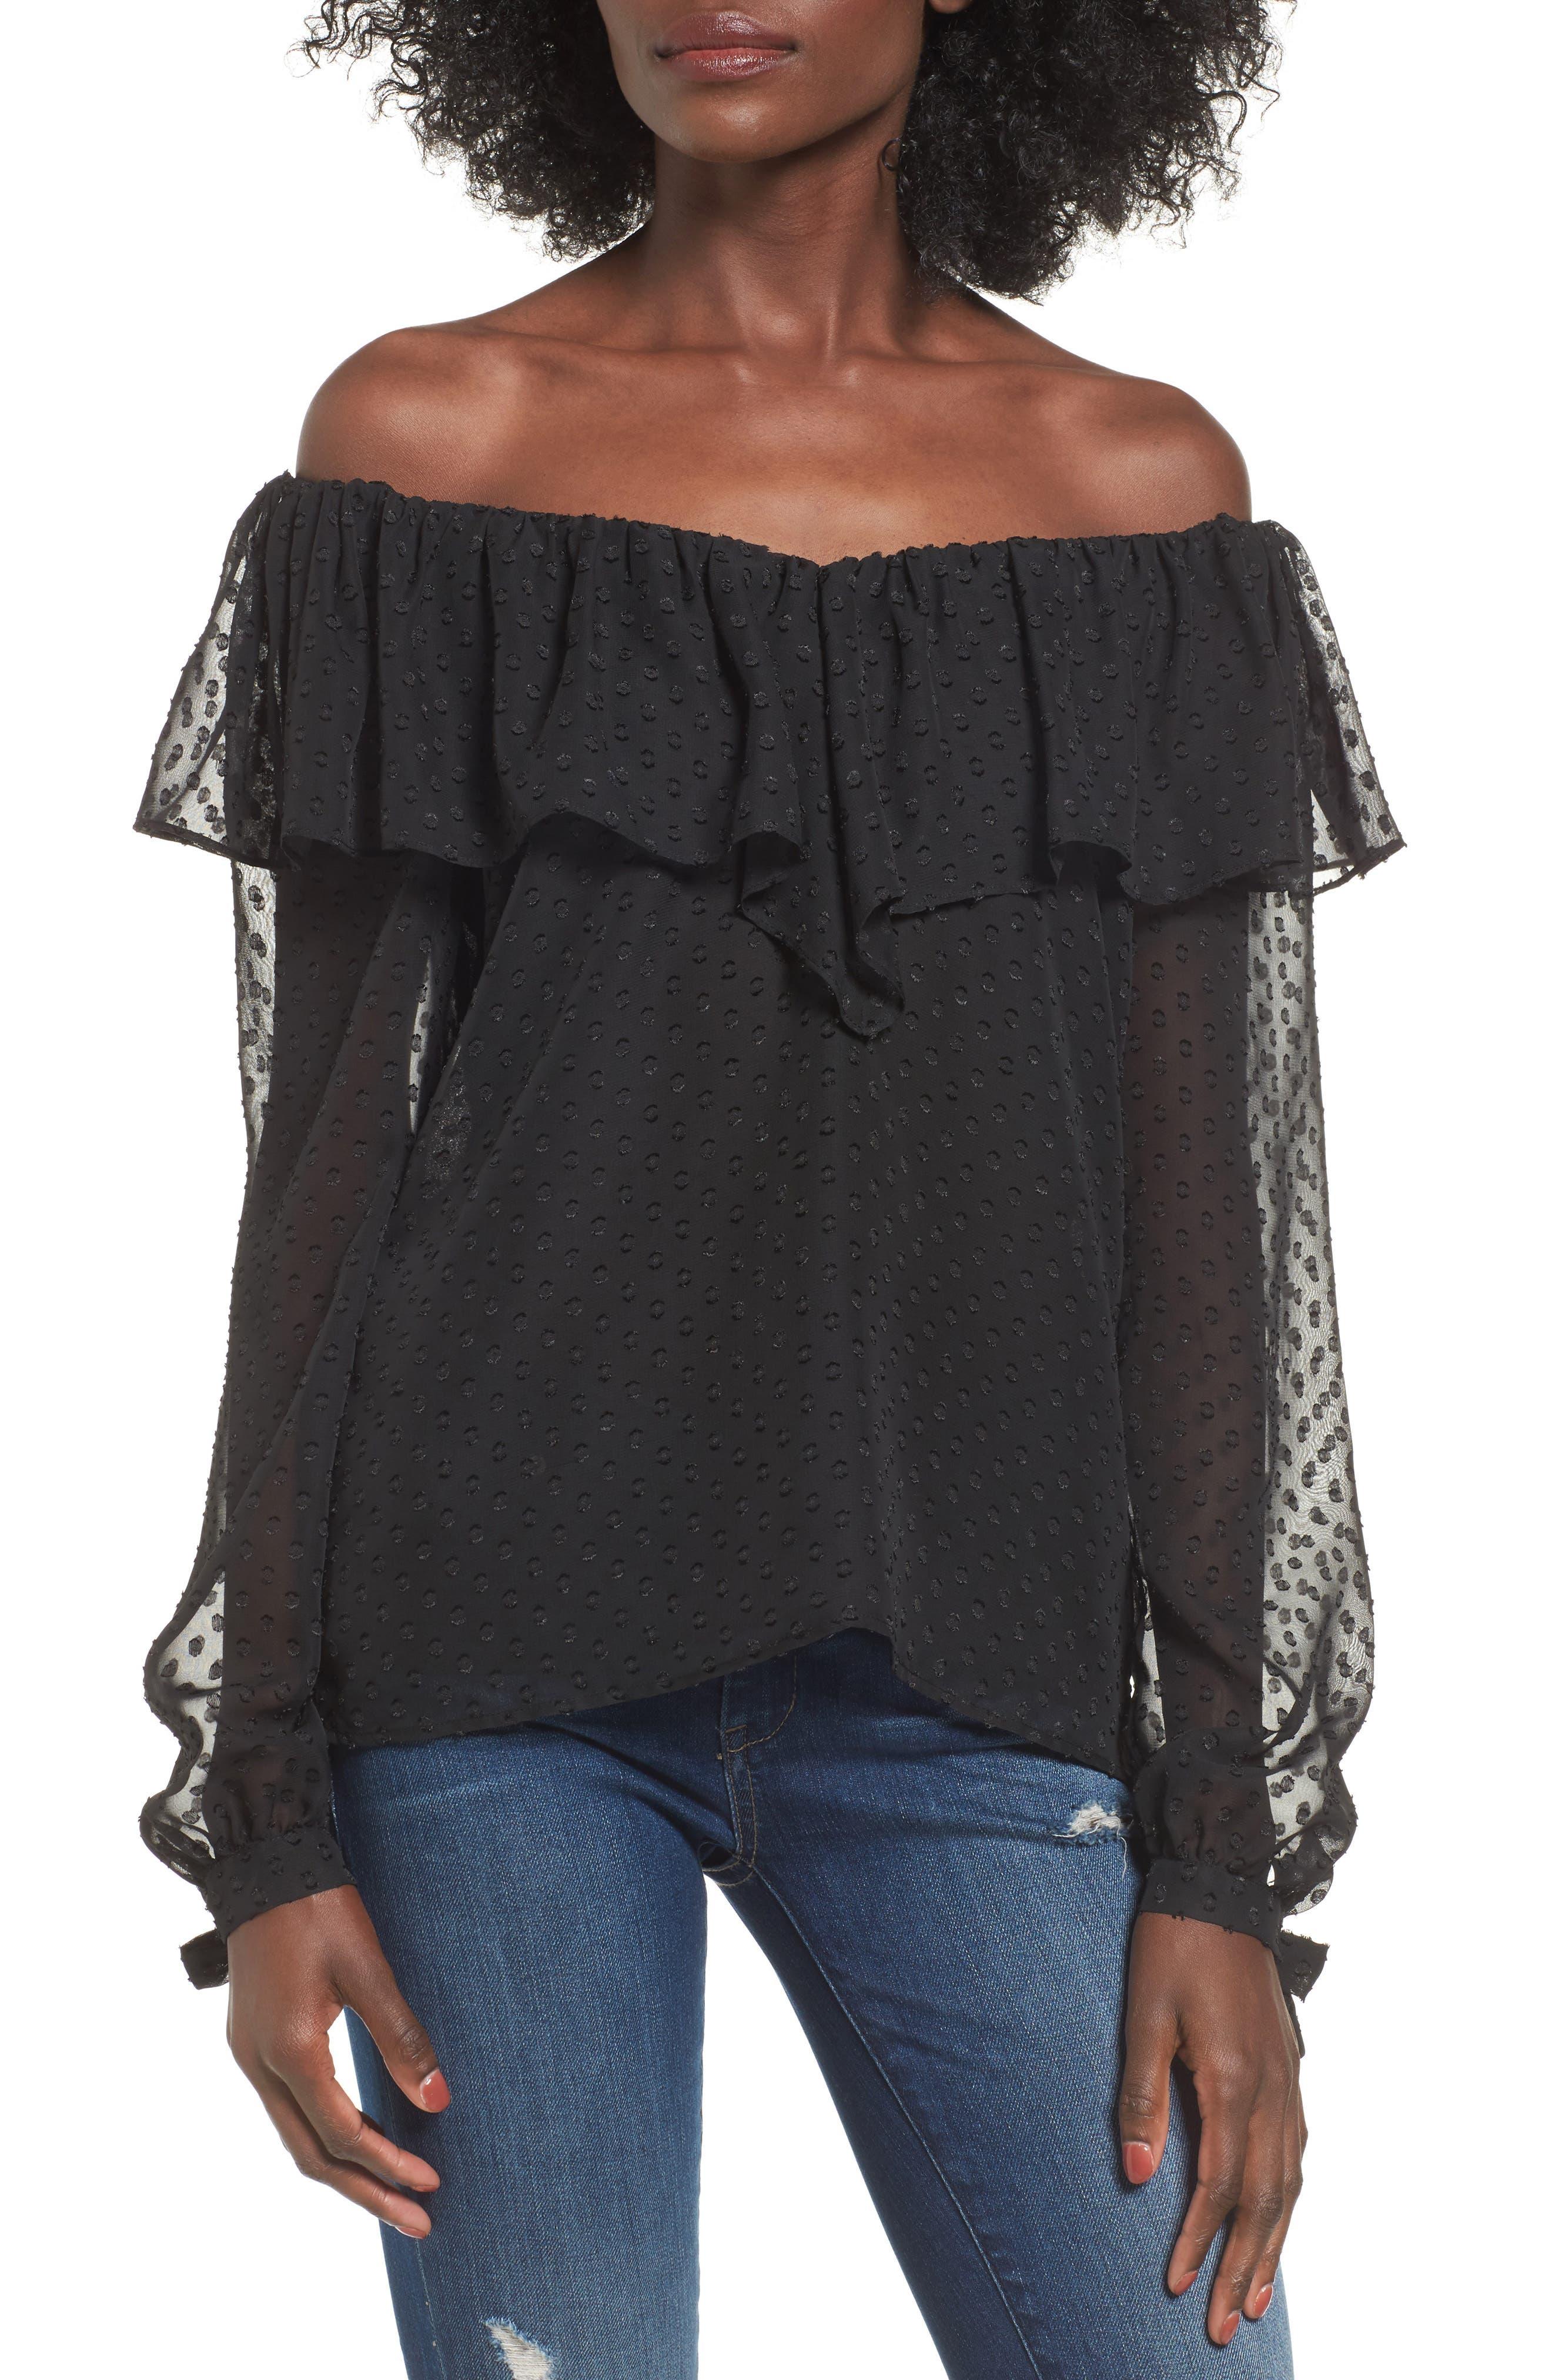 Kiere Ruffle Off the Shoulder Top,                         Main,                         color, Black